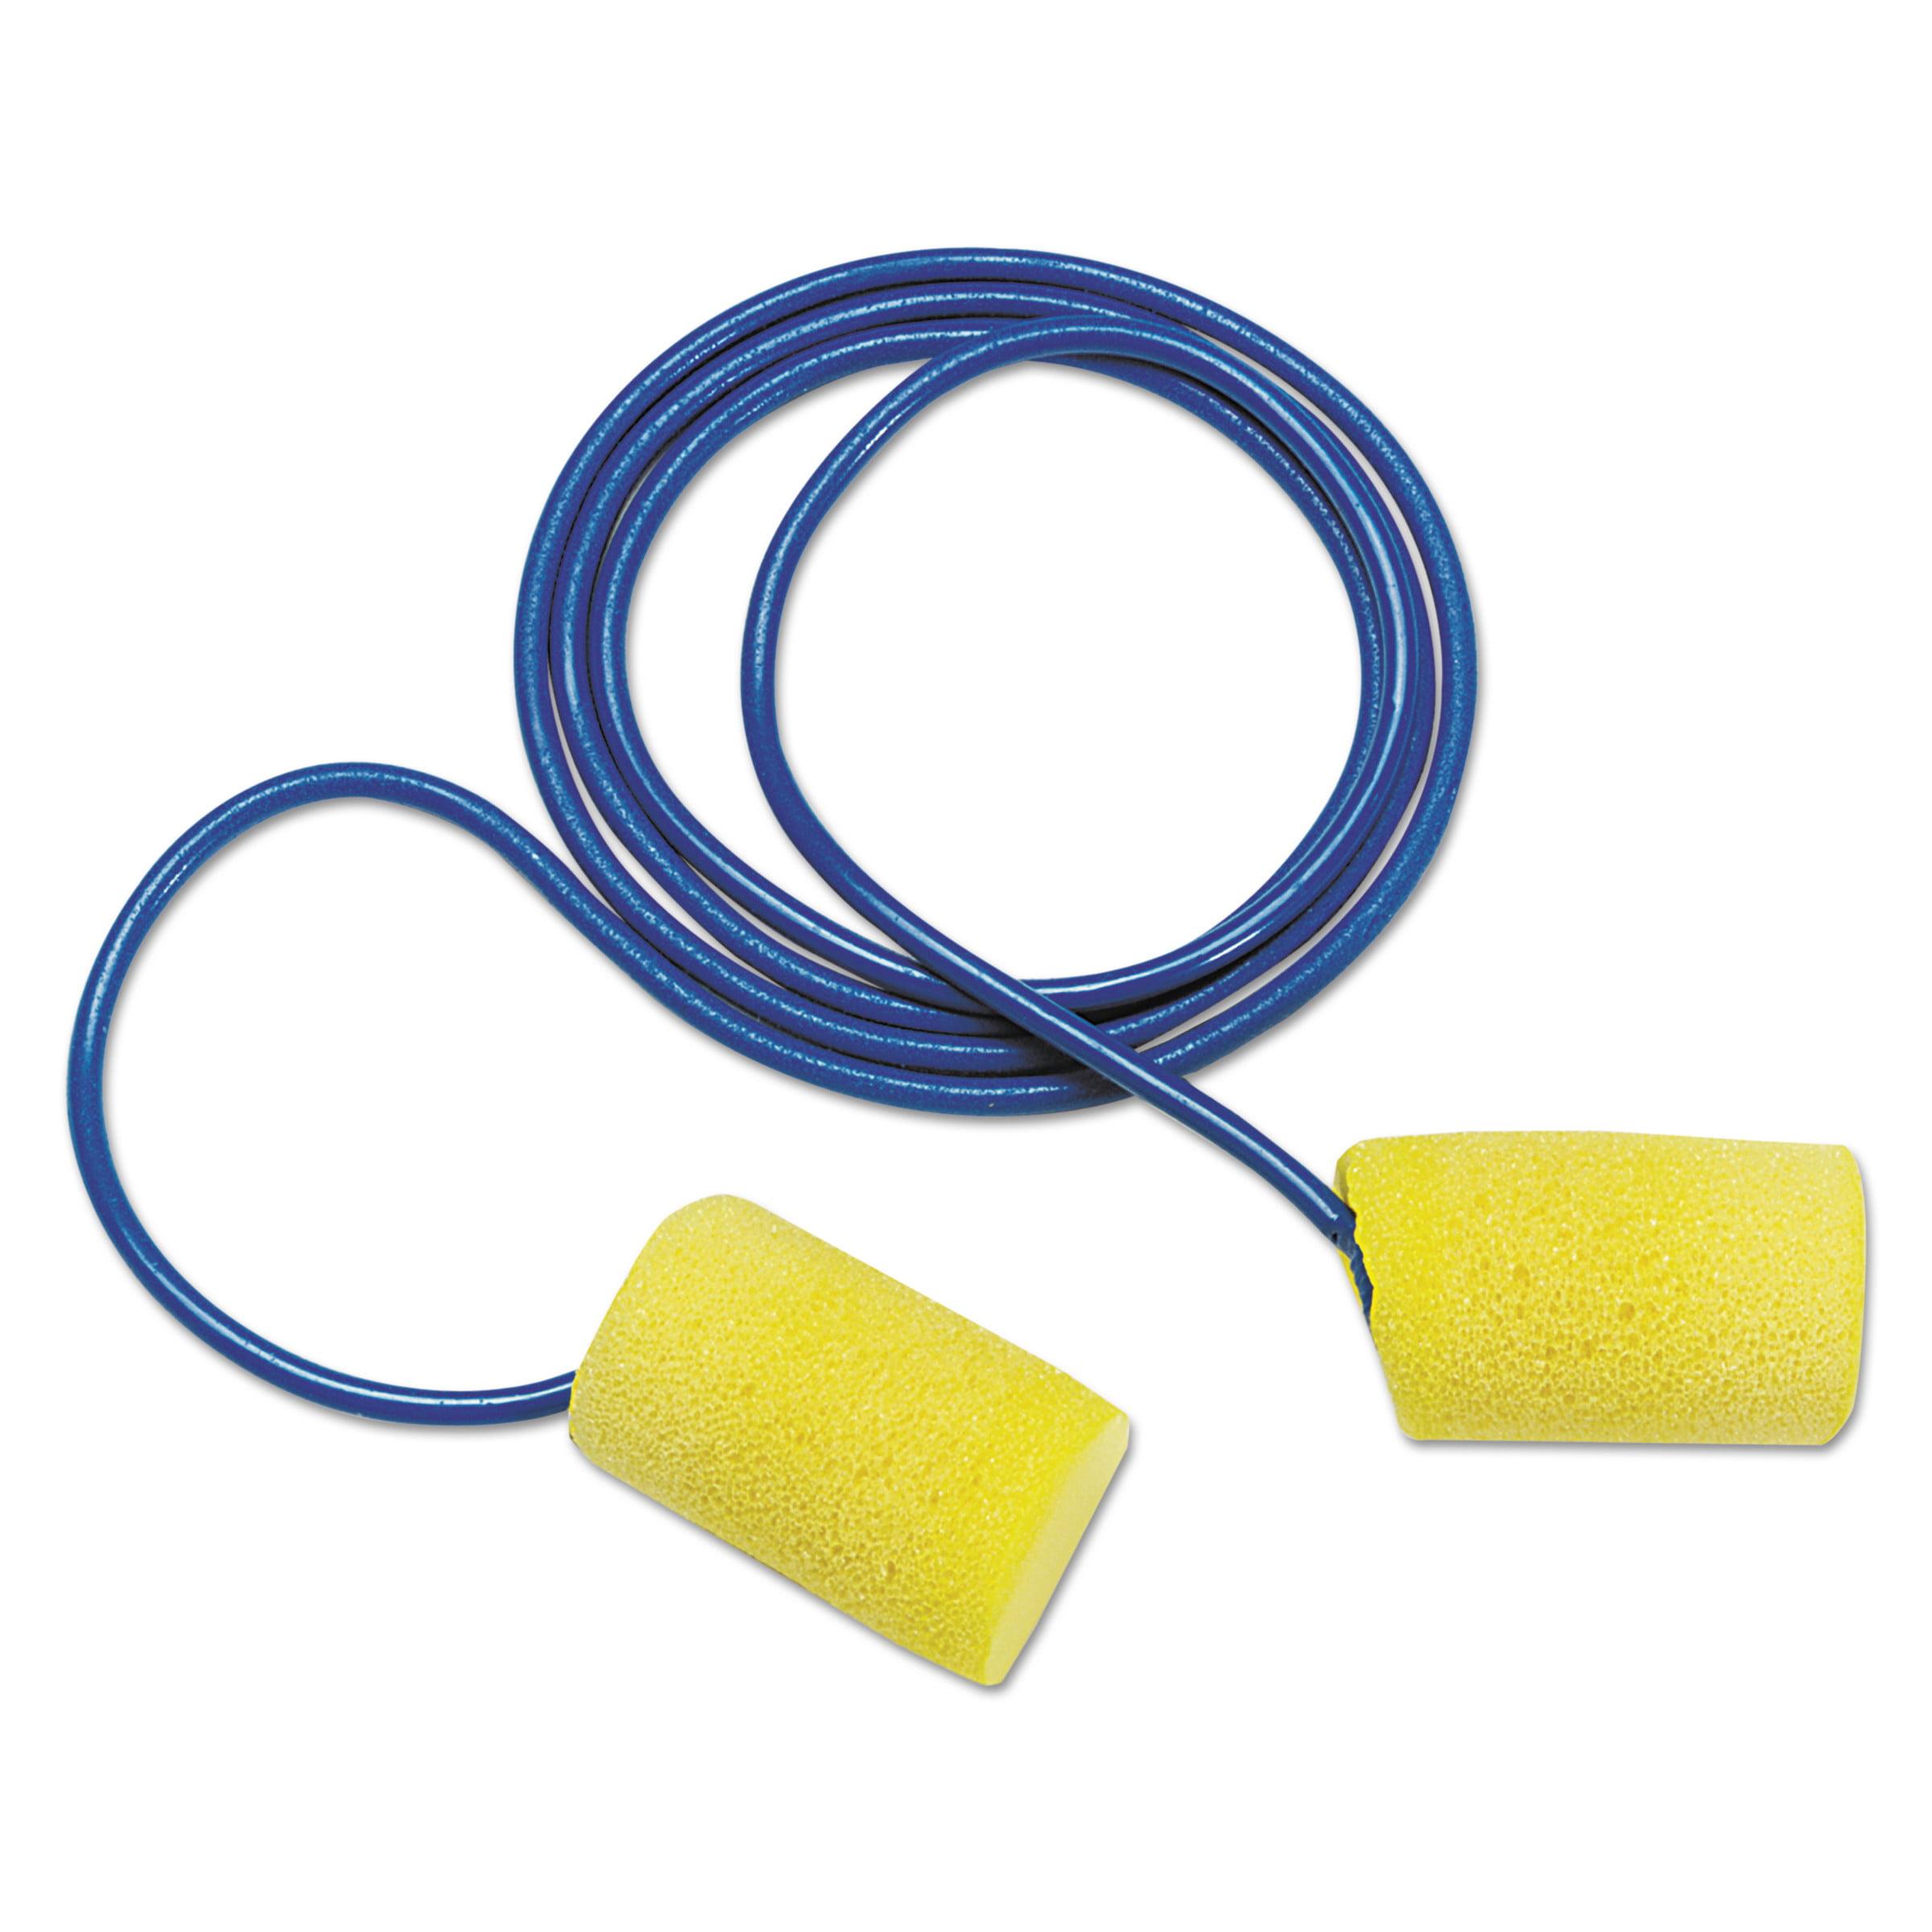 3M E·A·R Classic Earplugs, Corded, PVC Foam, Yellow, 200 Pairs